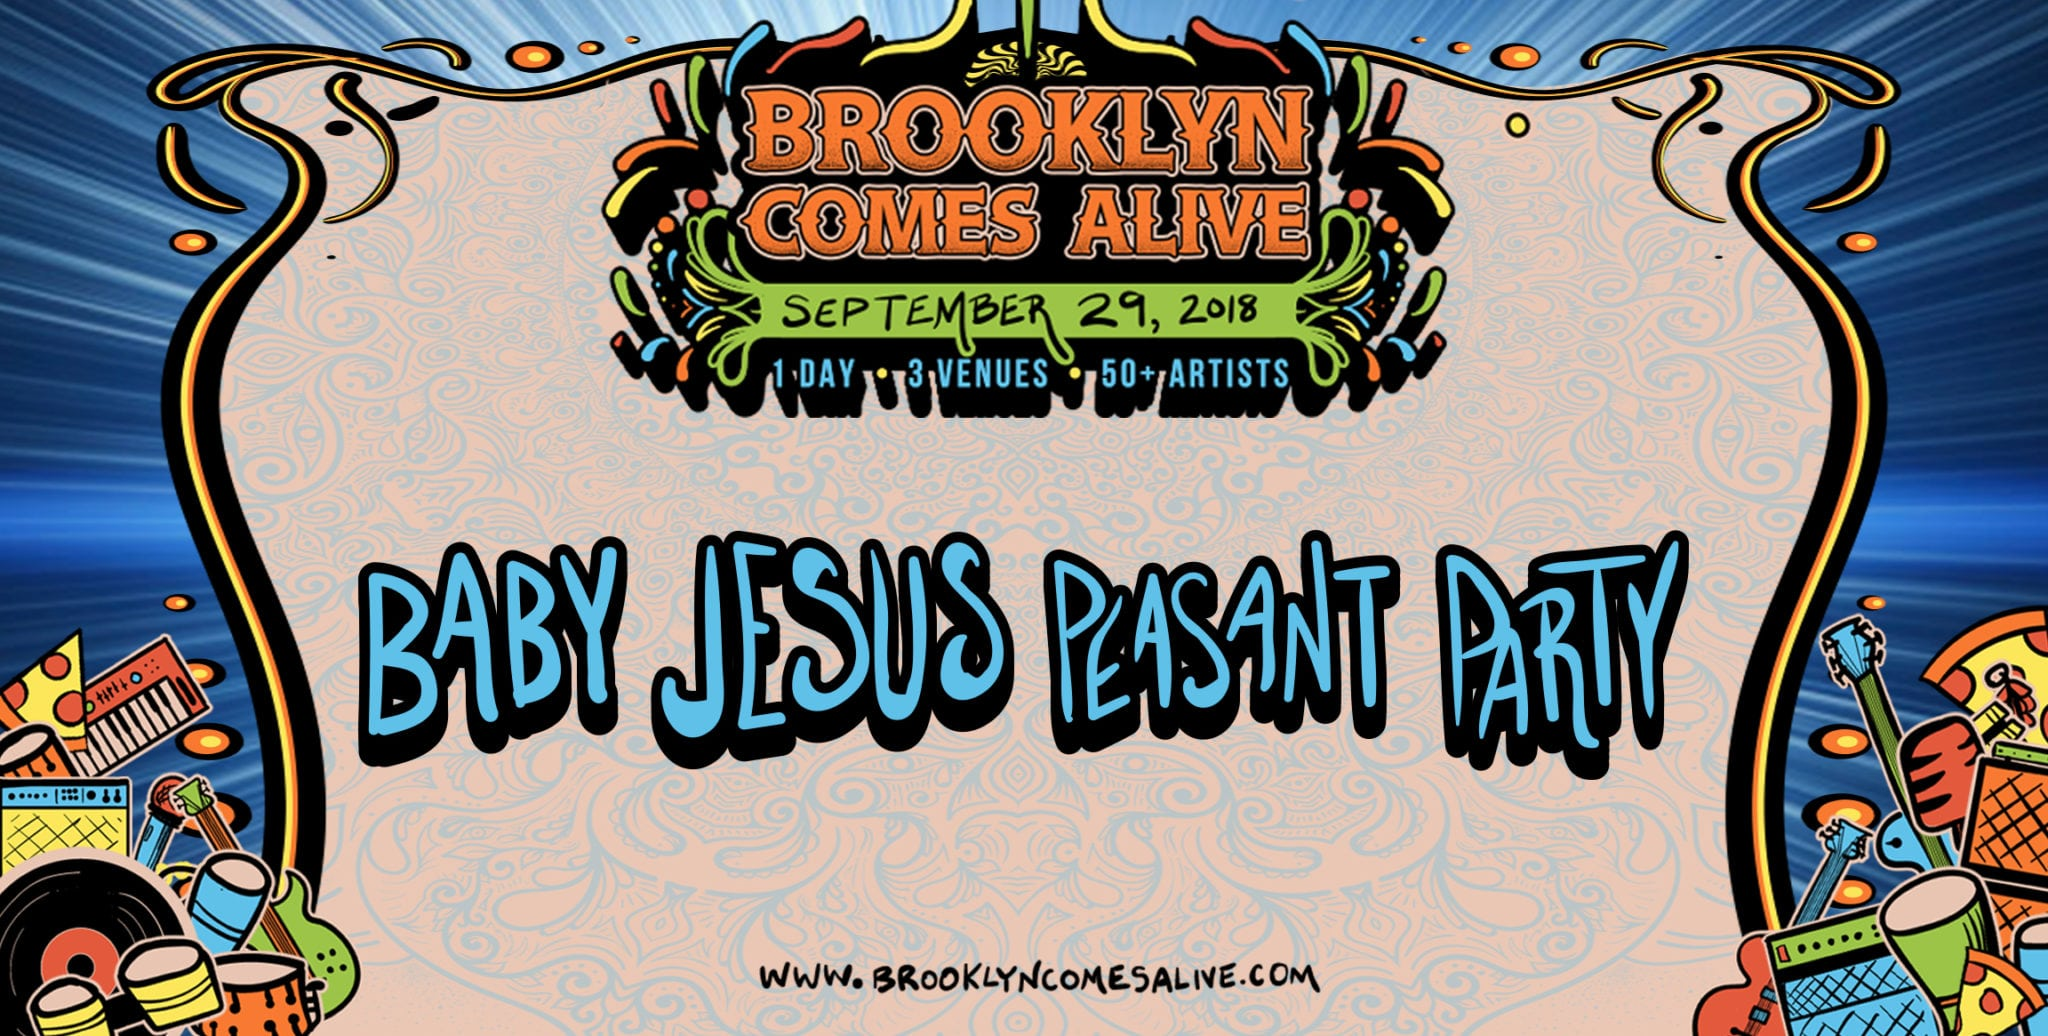 Lettuce's Jesus Coomes To Debut His 'Baby Jesus Peasant